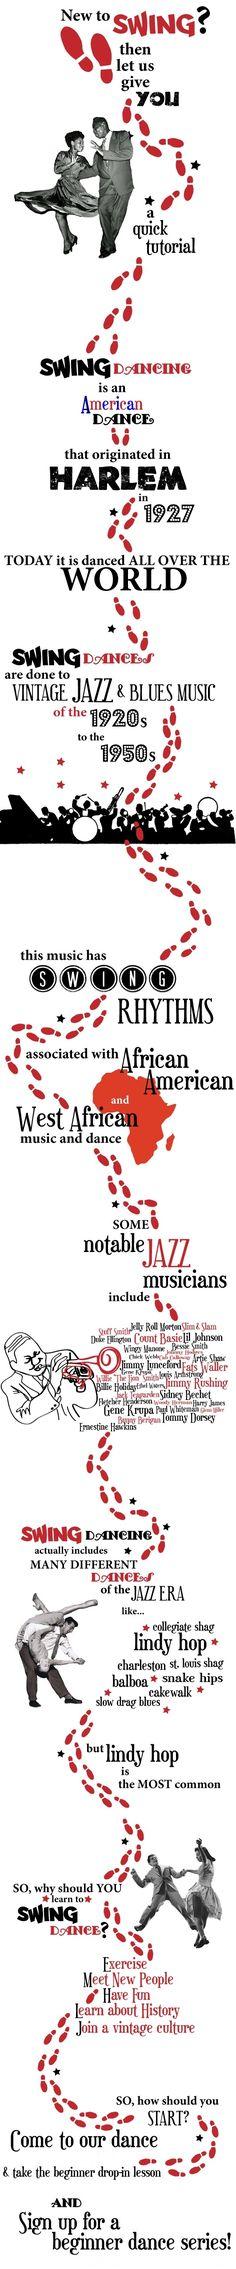 A D D F B Afe E D E B D Swing Dance Lessons Swing Dancing on Lindy Hop Steps Diagram